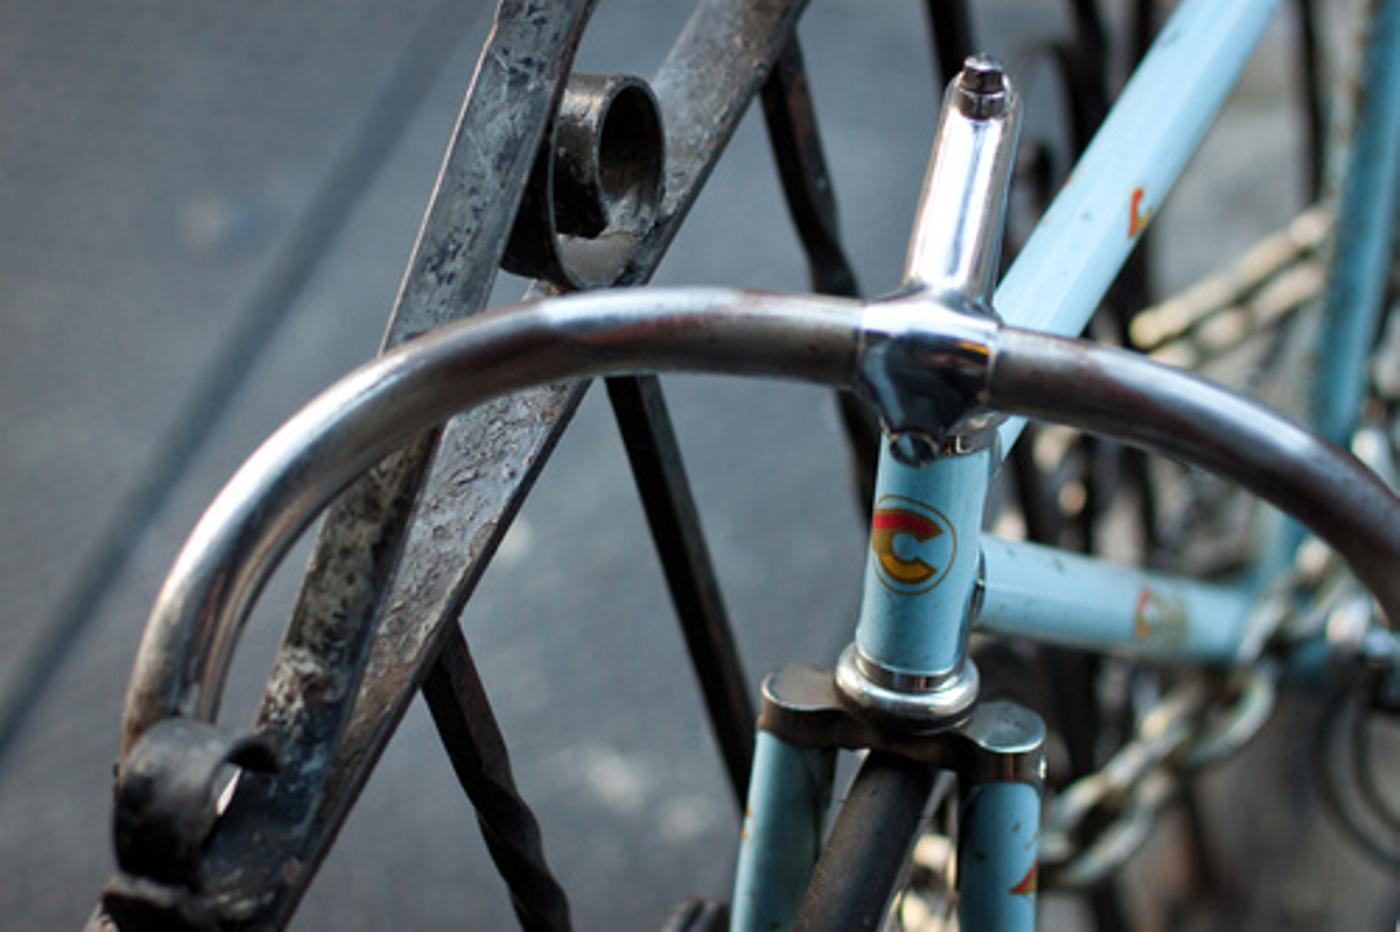 LockedUp-Cinelli-06-PINP.jpg